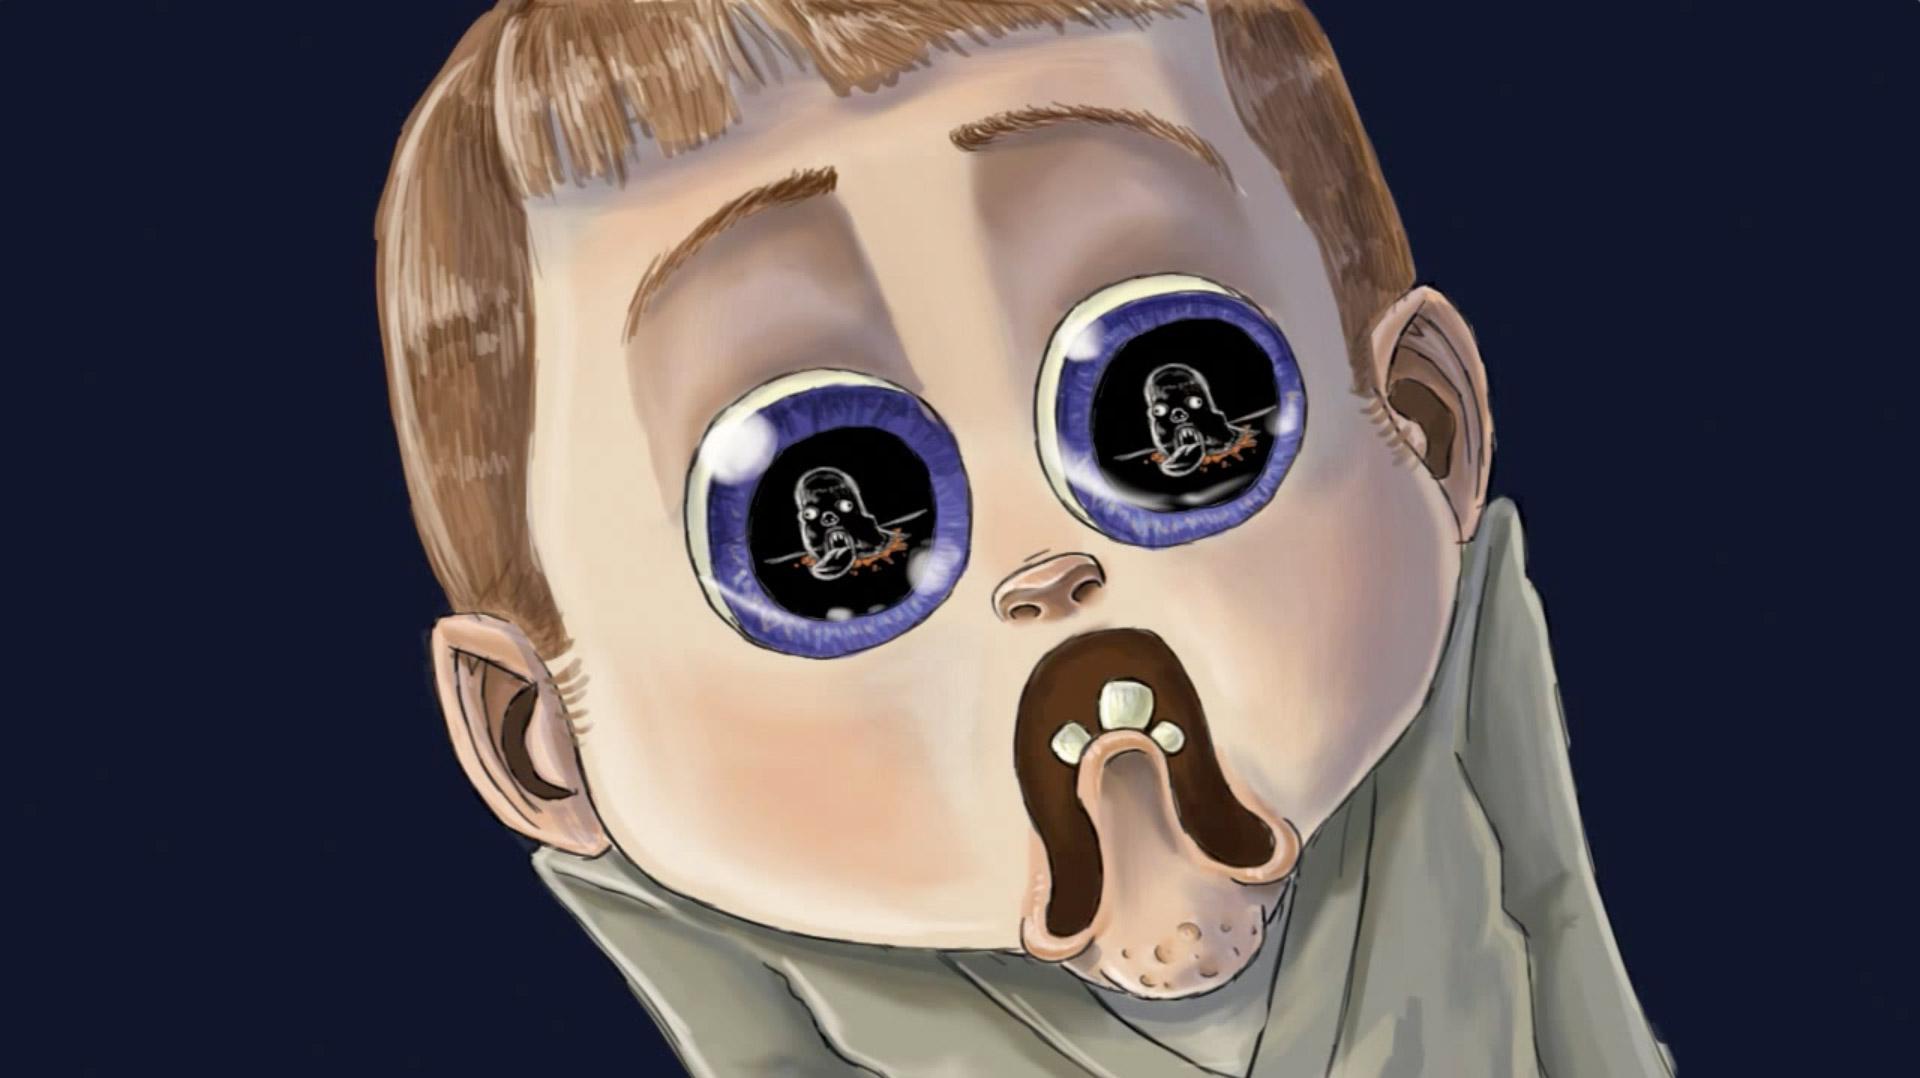 patton-oswalts-star-wars-fillbuster-gets-animated-12.jpg